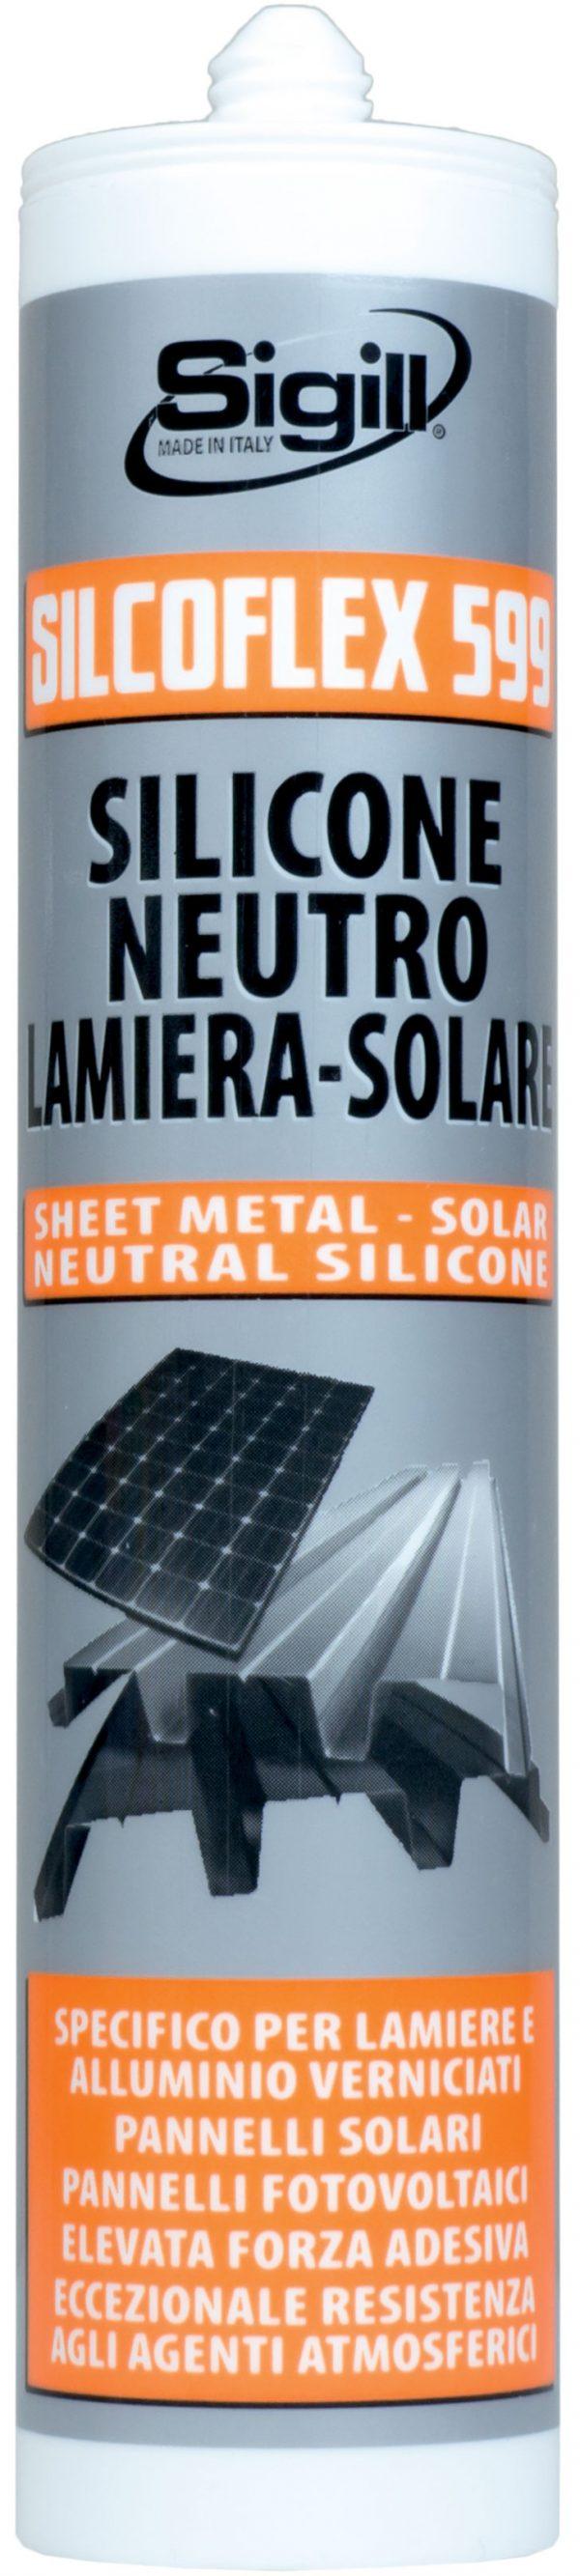 construction sealant, glazing sealant, Single-component silicone sealant, SILCOFLEX 599